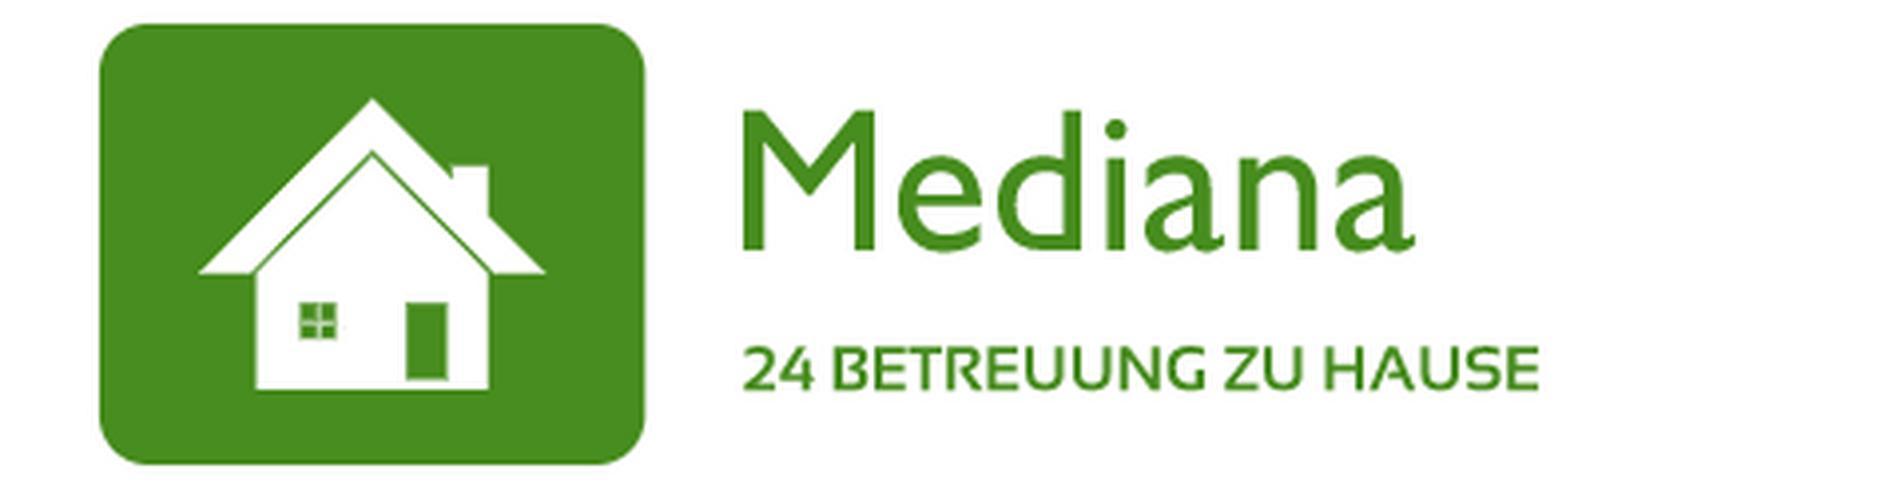 "24 Betreuung Zu Hause - ""Mediana""-"